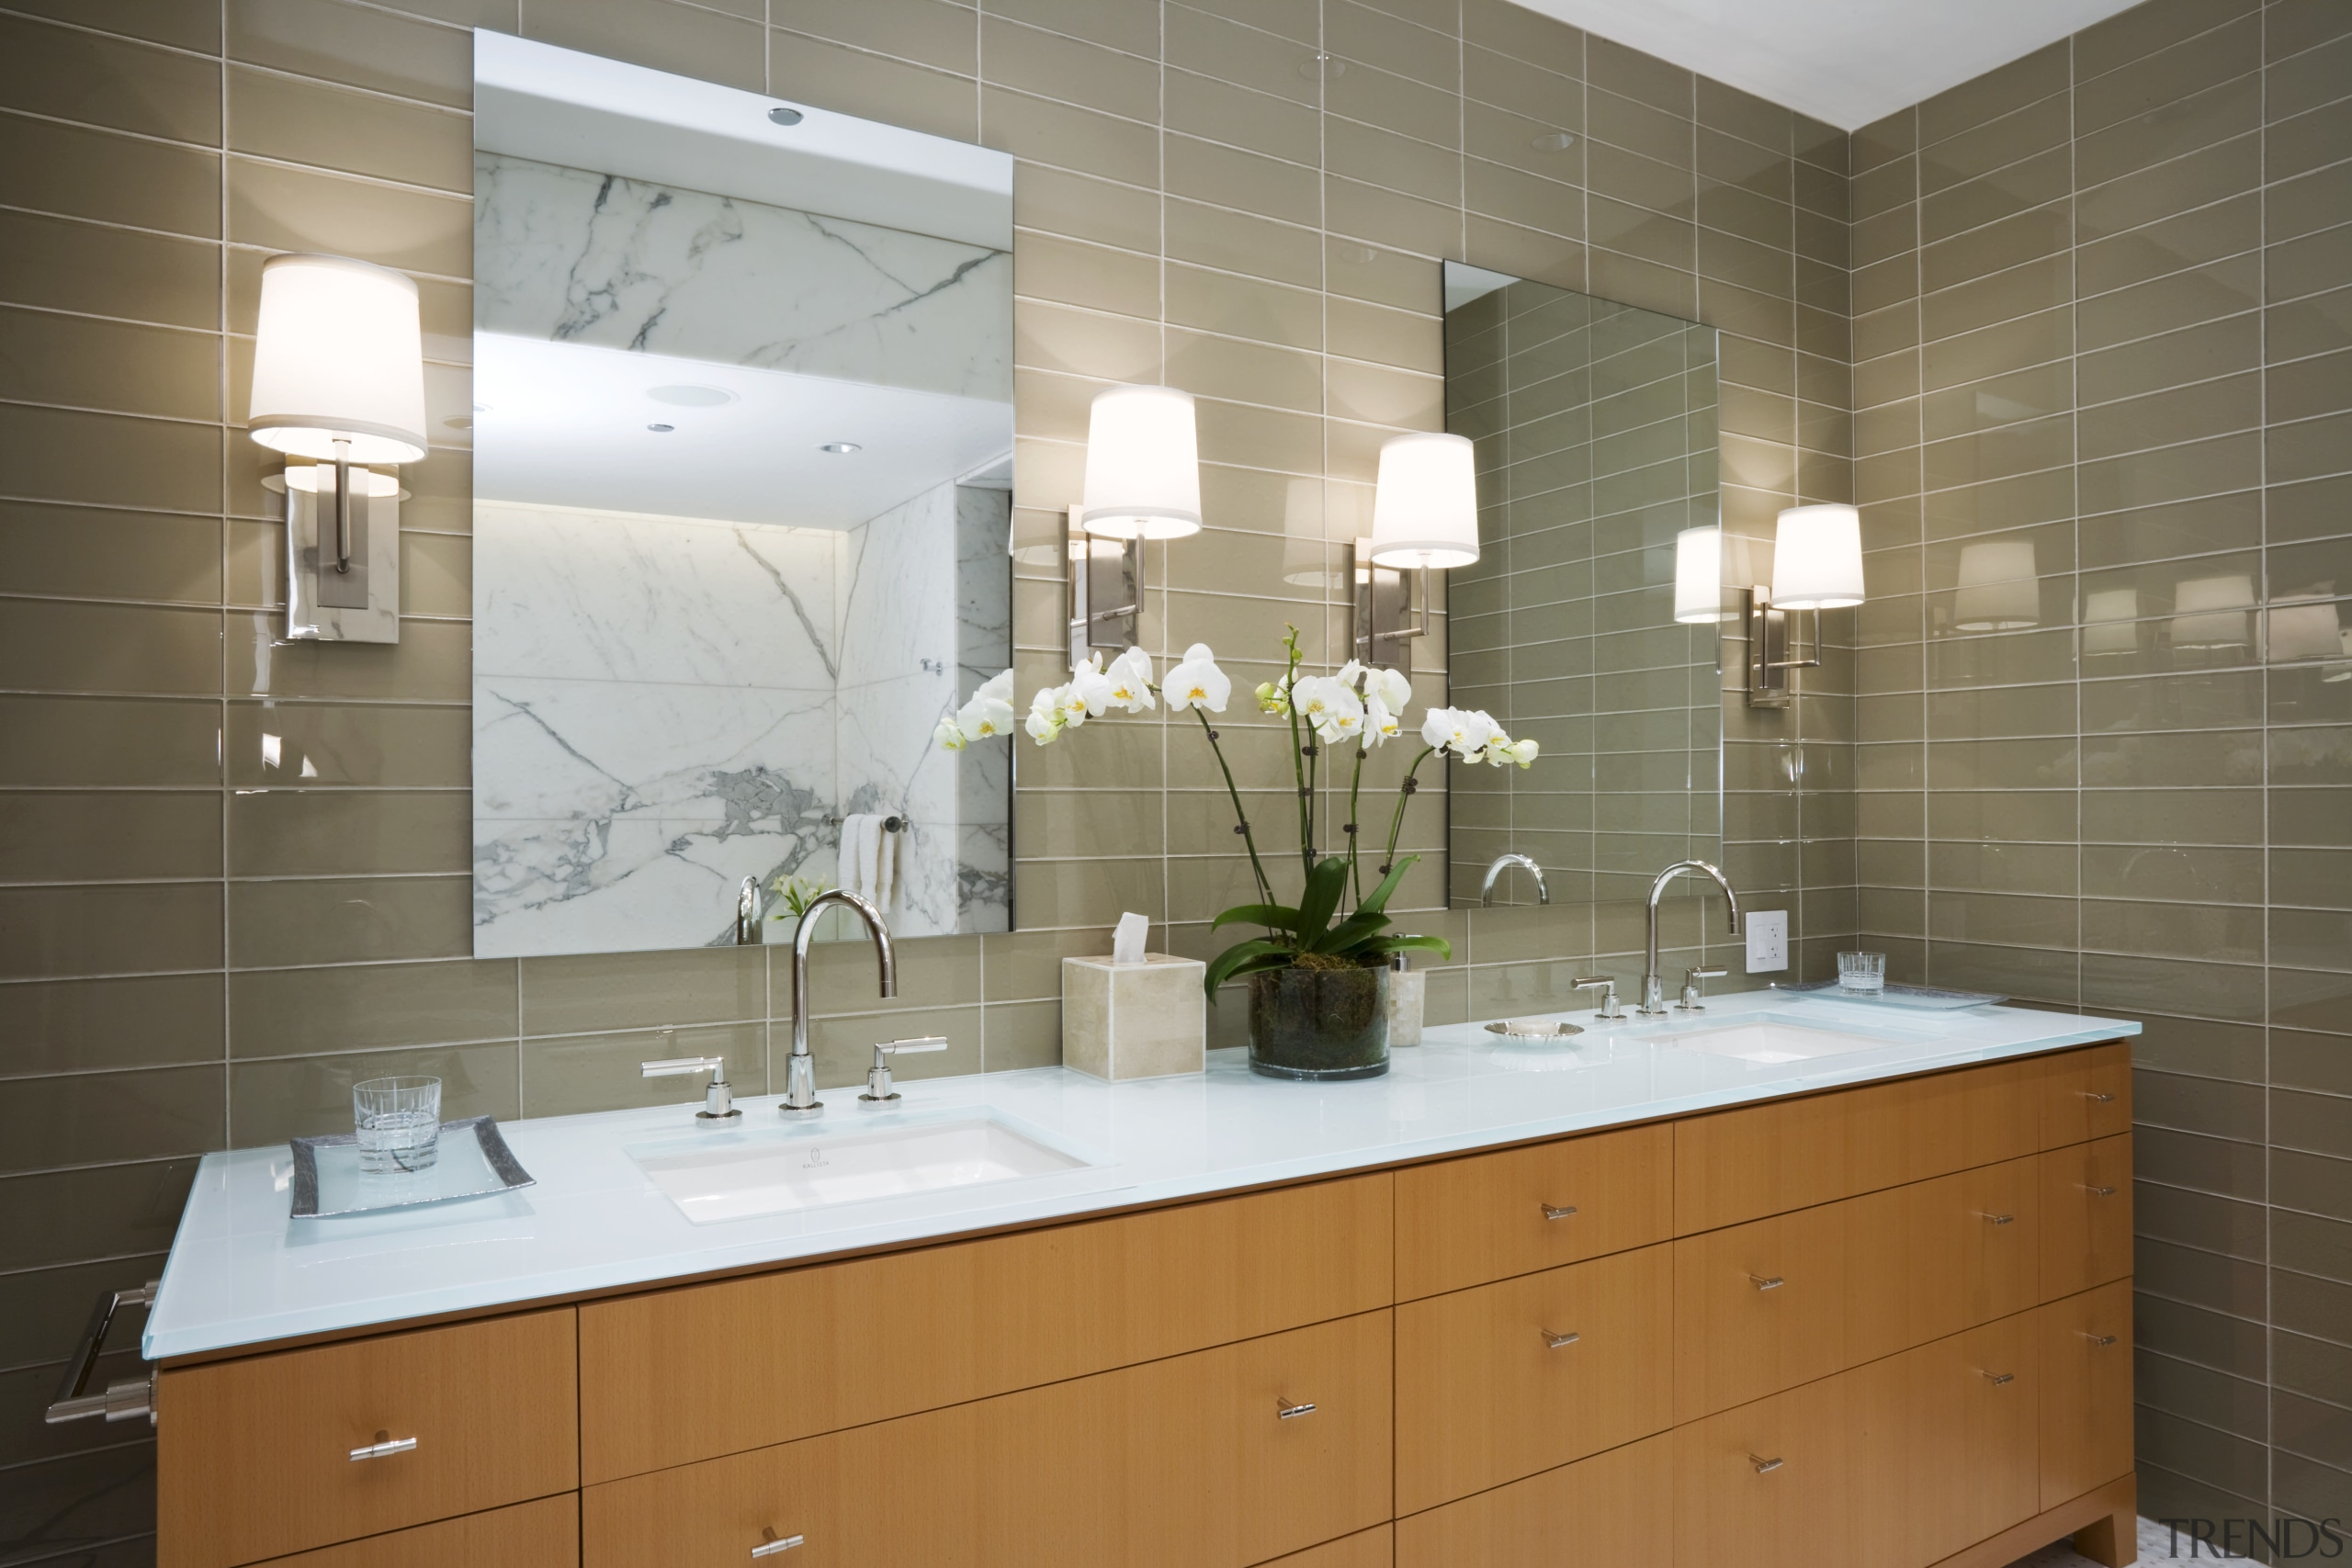 View of bathroom featuring vanity, basin, tapware, mirror, bathroom, countertop, home, interior design, kitchen, room, sink, tile, brown, gray